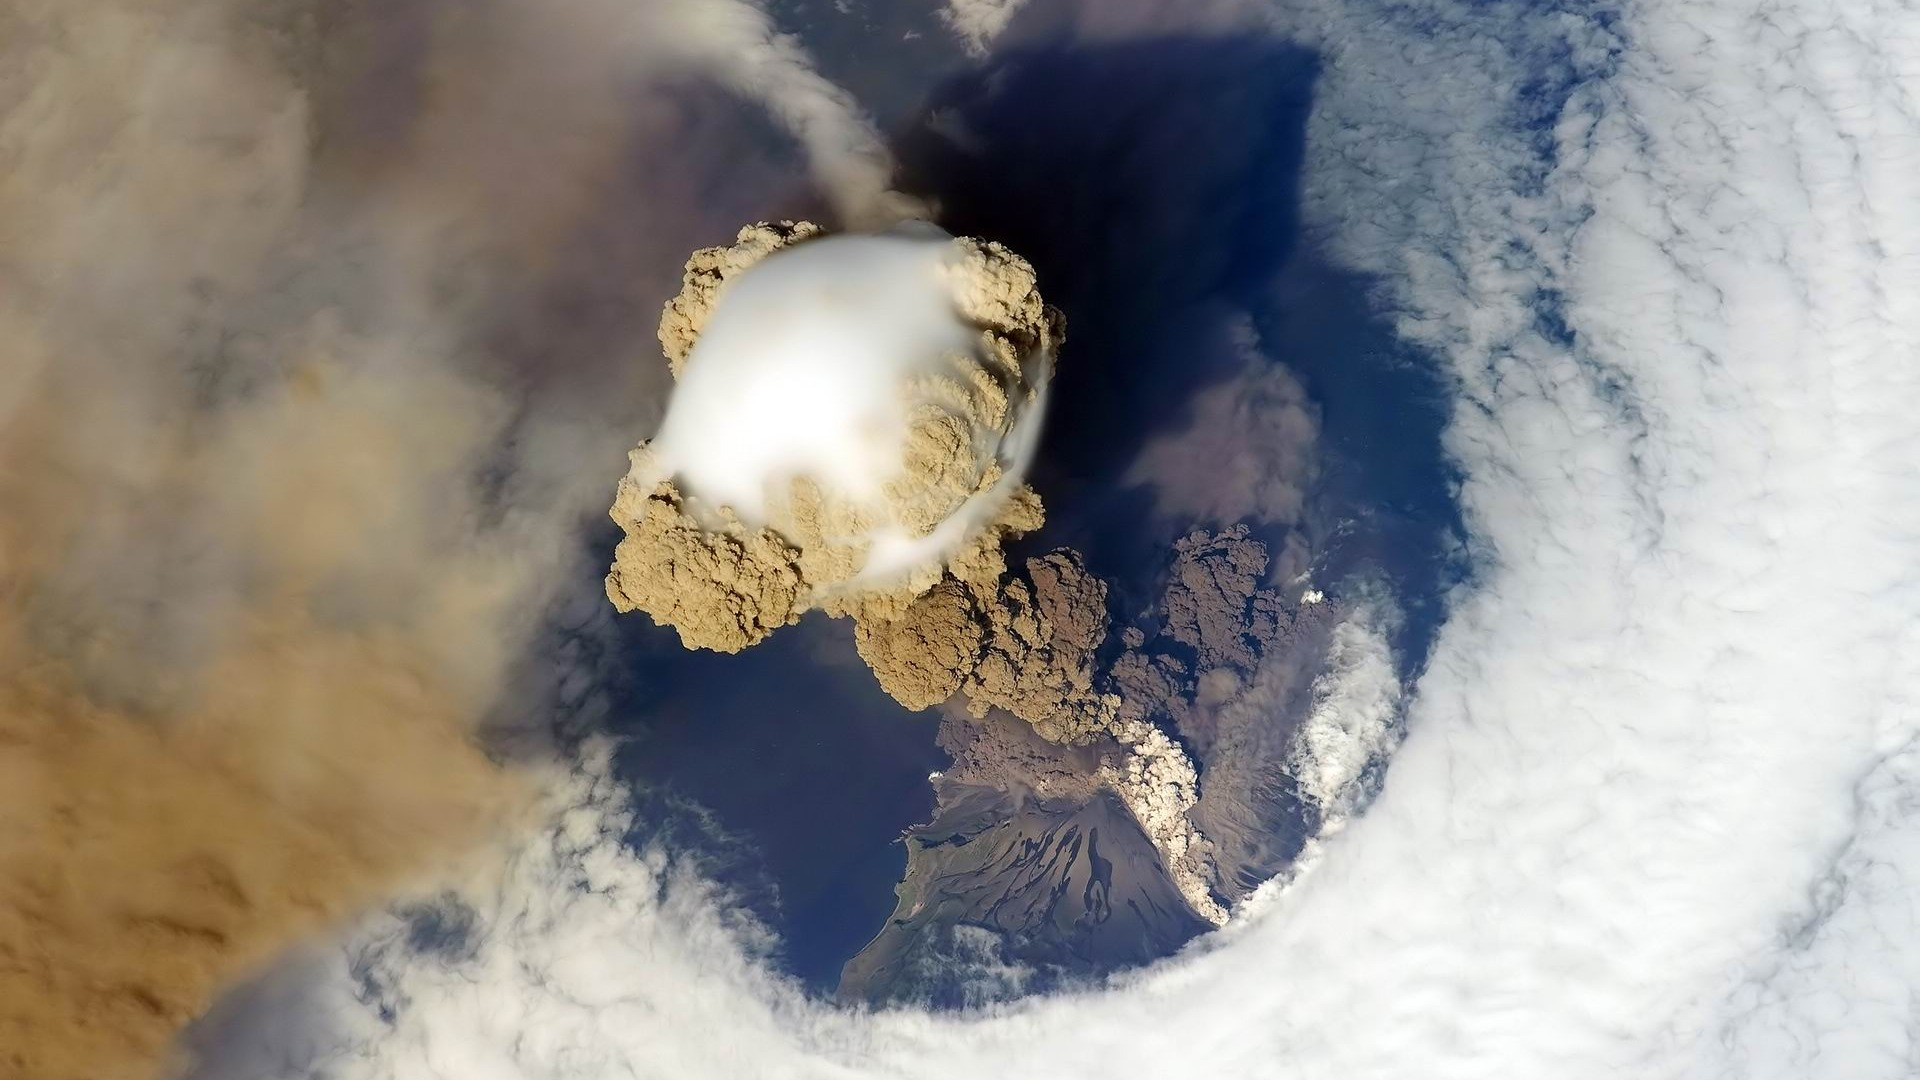 Volcanic_eruption-2012_landscape_Featured_Wallpaper_1920x1080.jpg